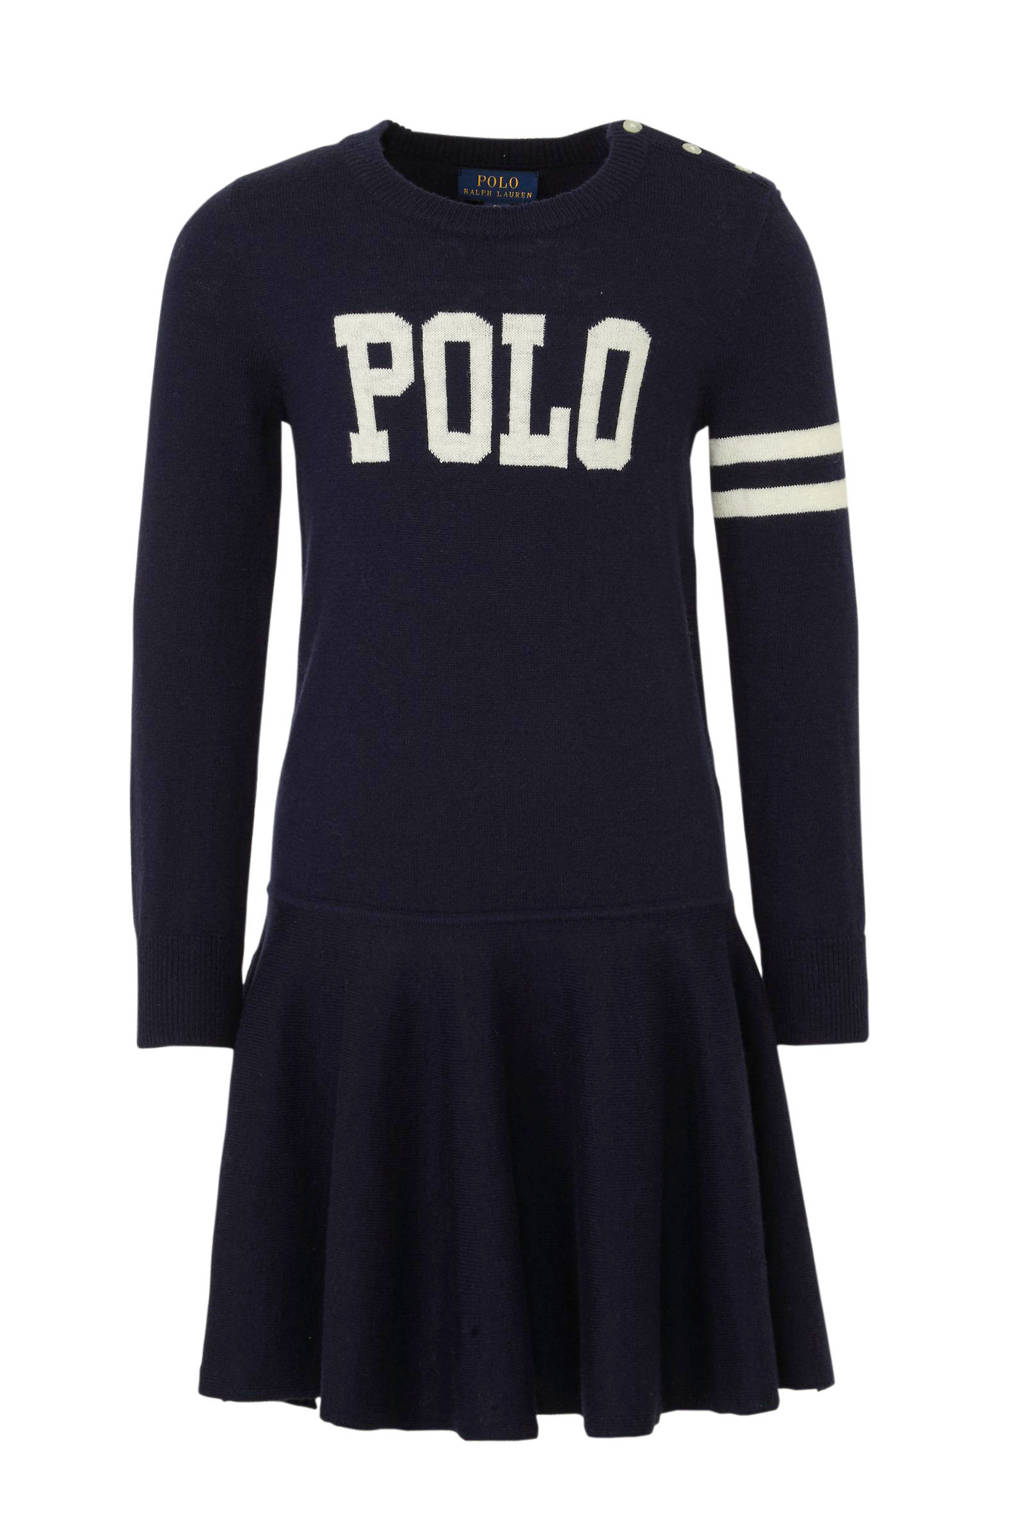 POLO Ralph Lauren gebreide jurk met wol donkerblauw, Donkerblauw